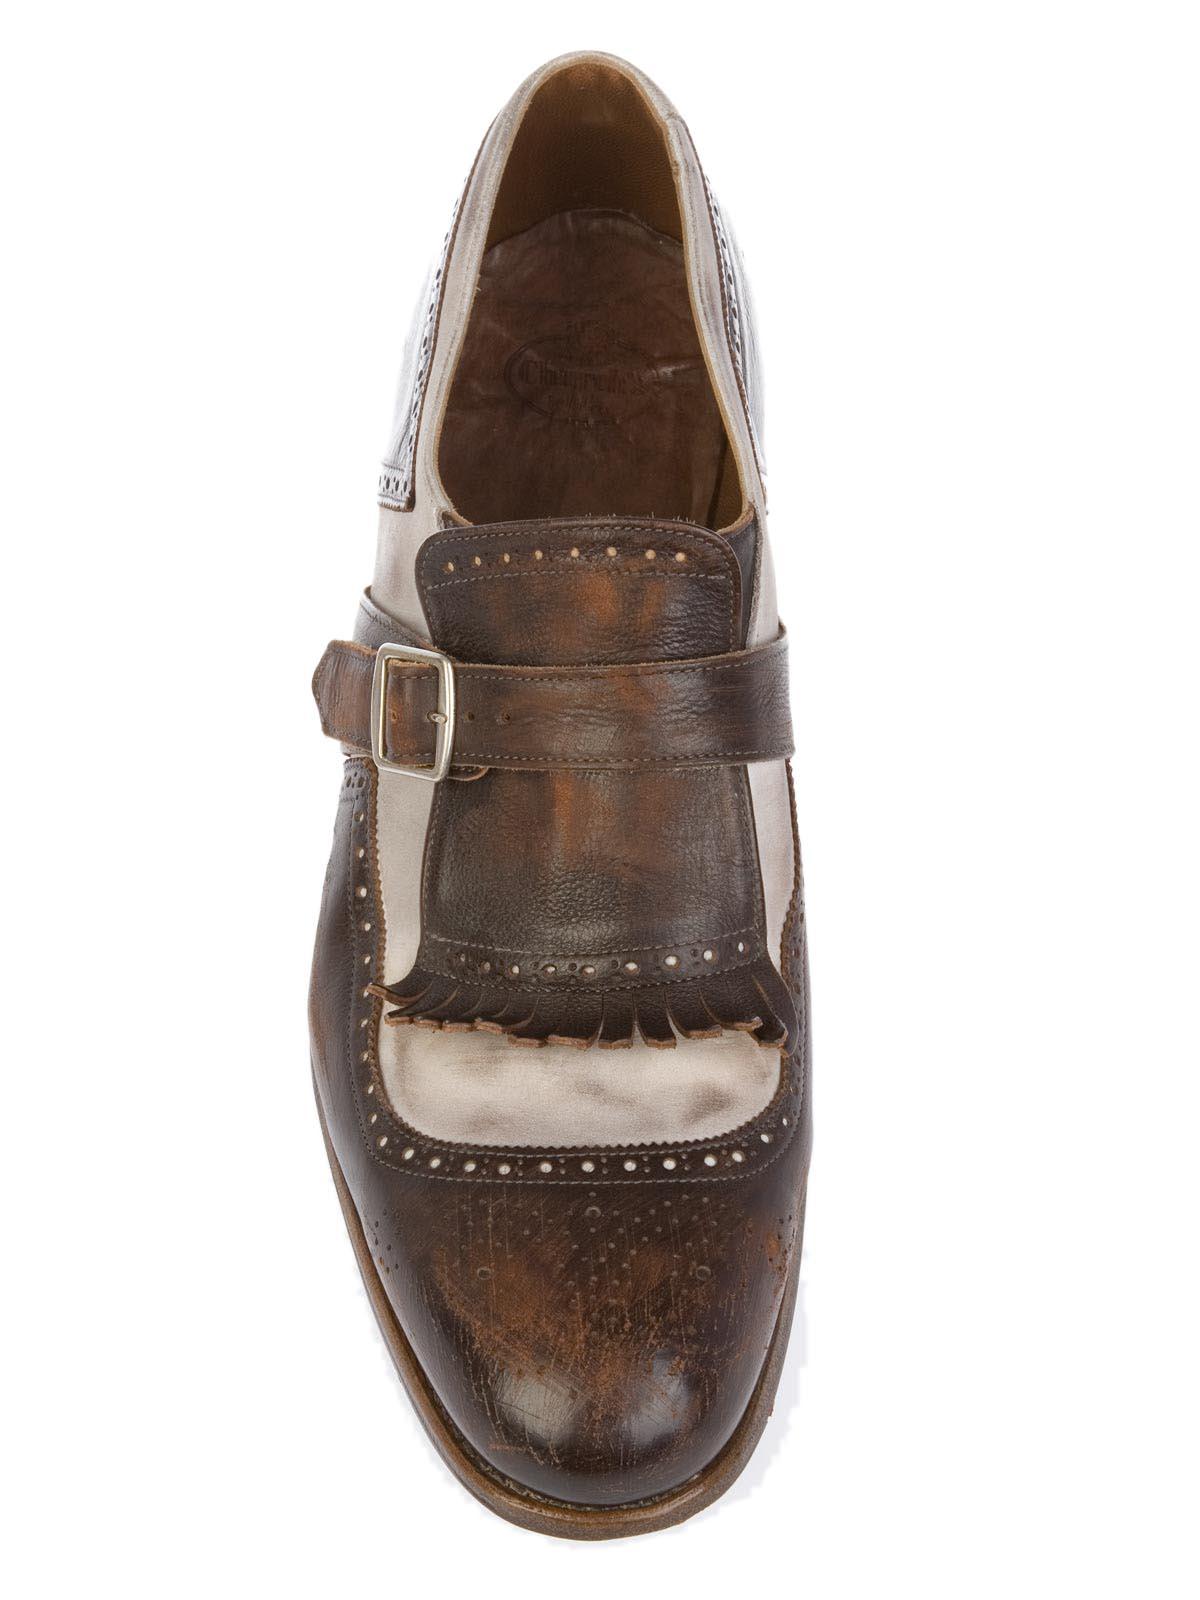 Acqua Italia Women Shoes